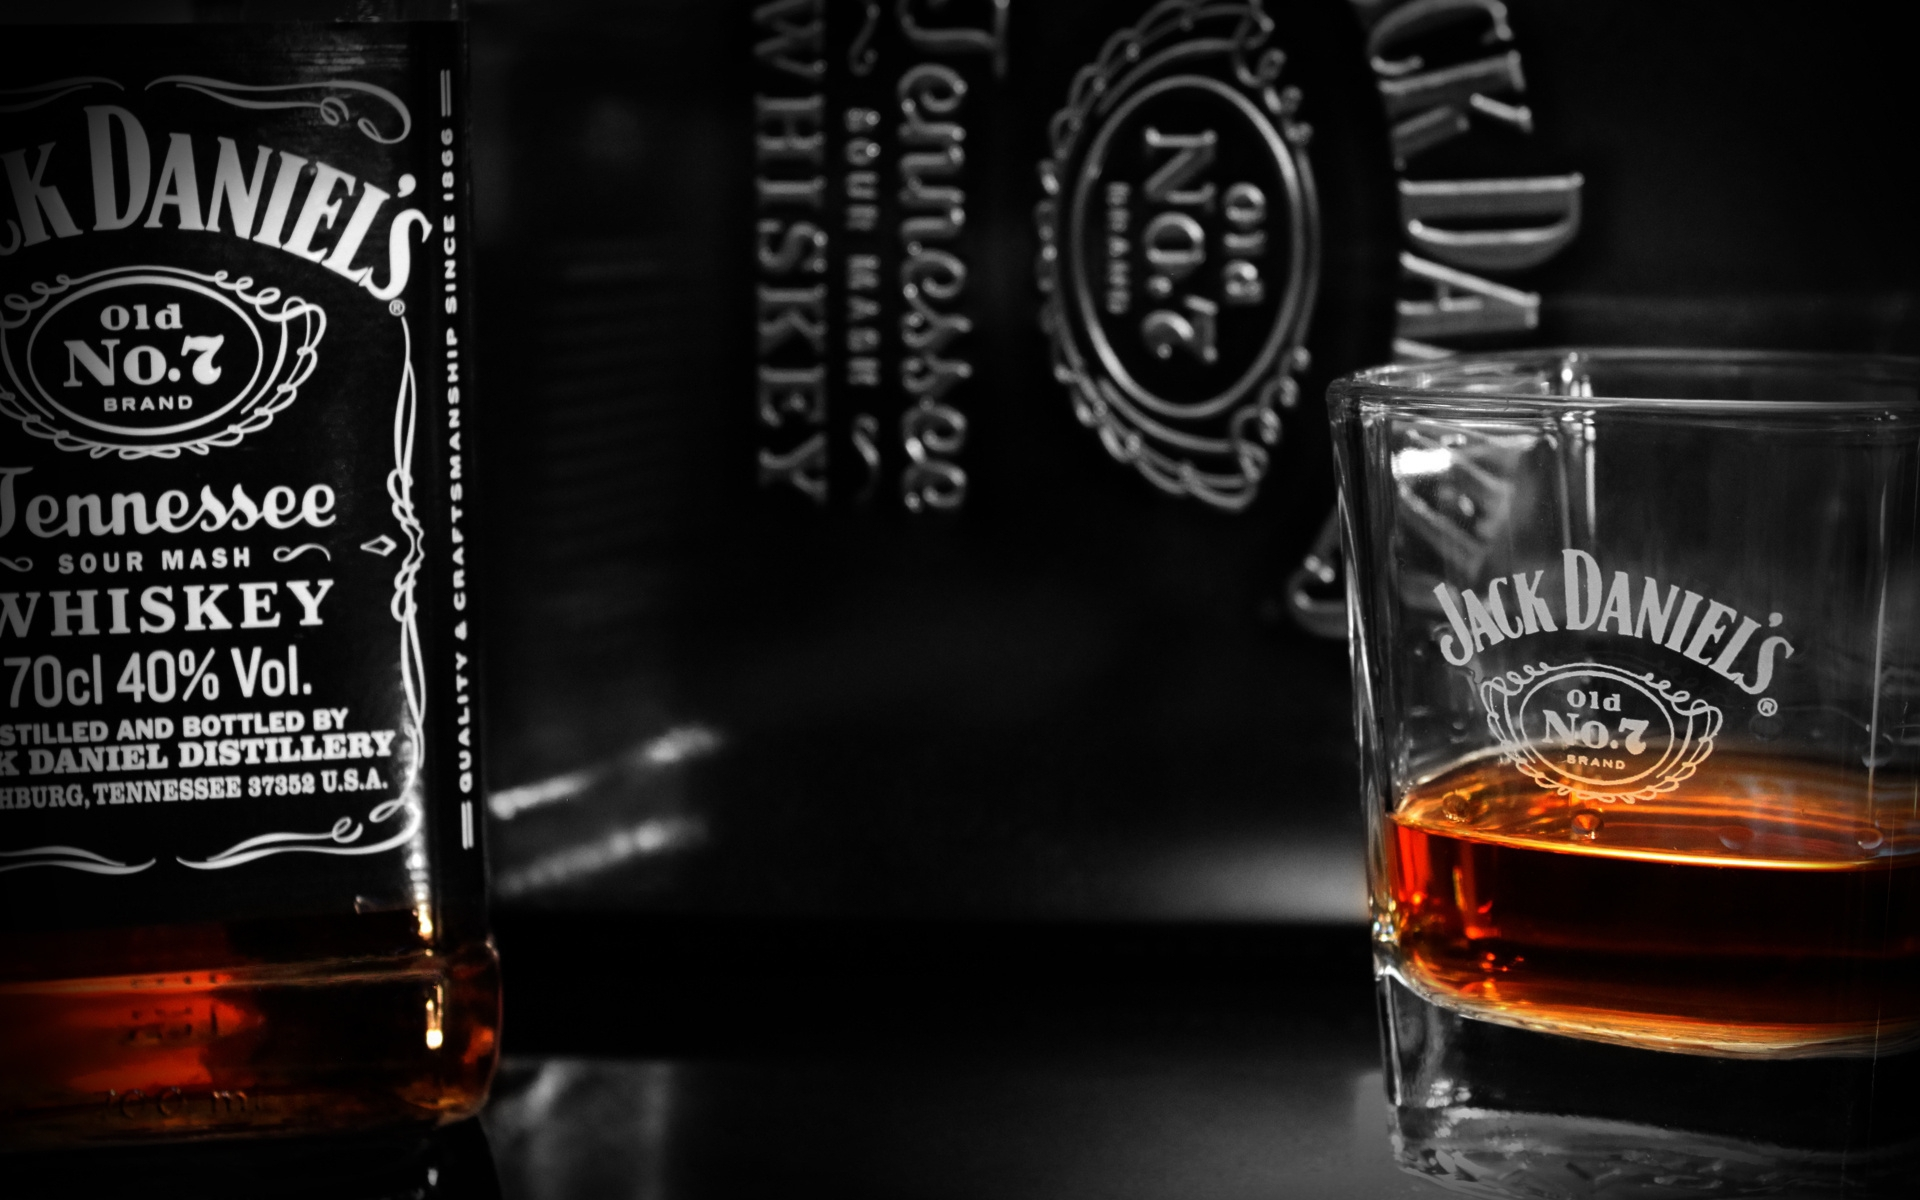 Jack Daniels Wallpapers Hd